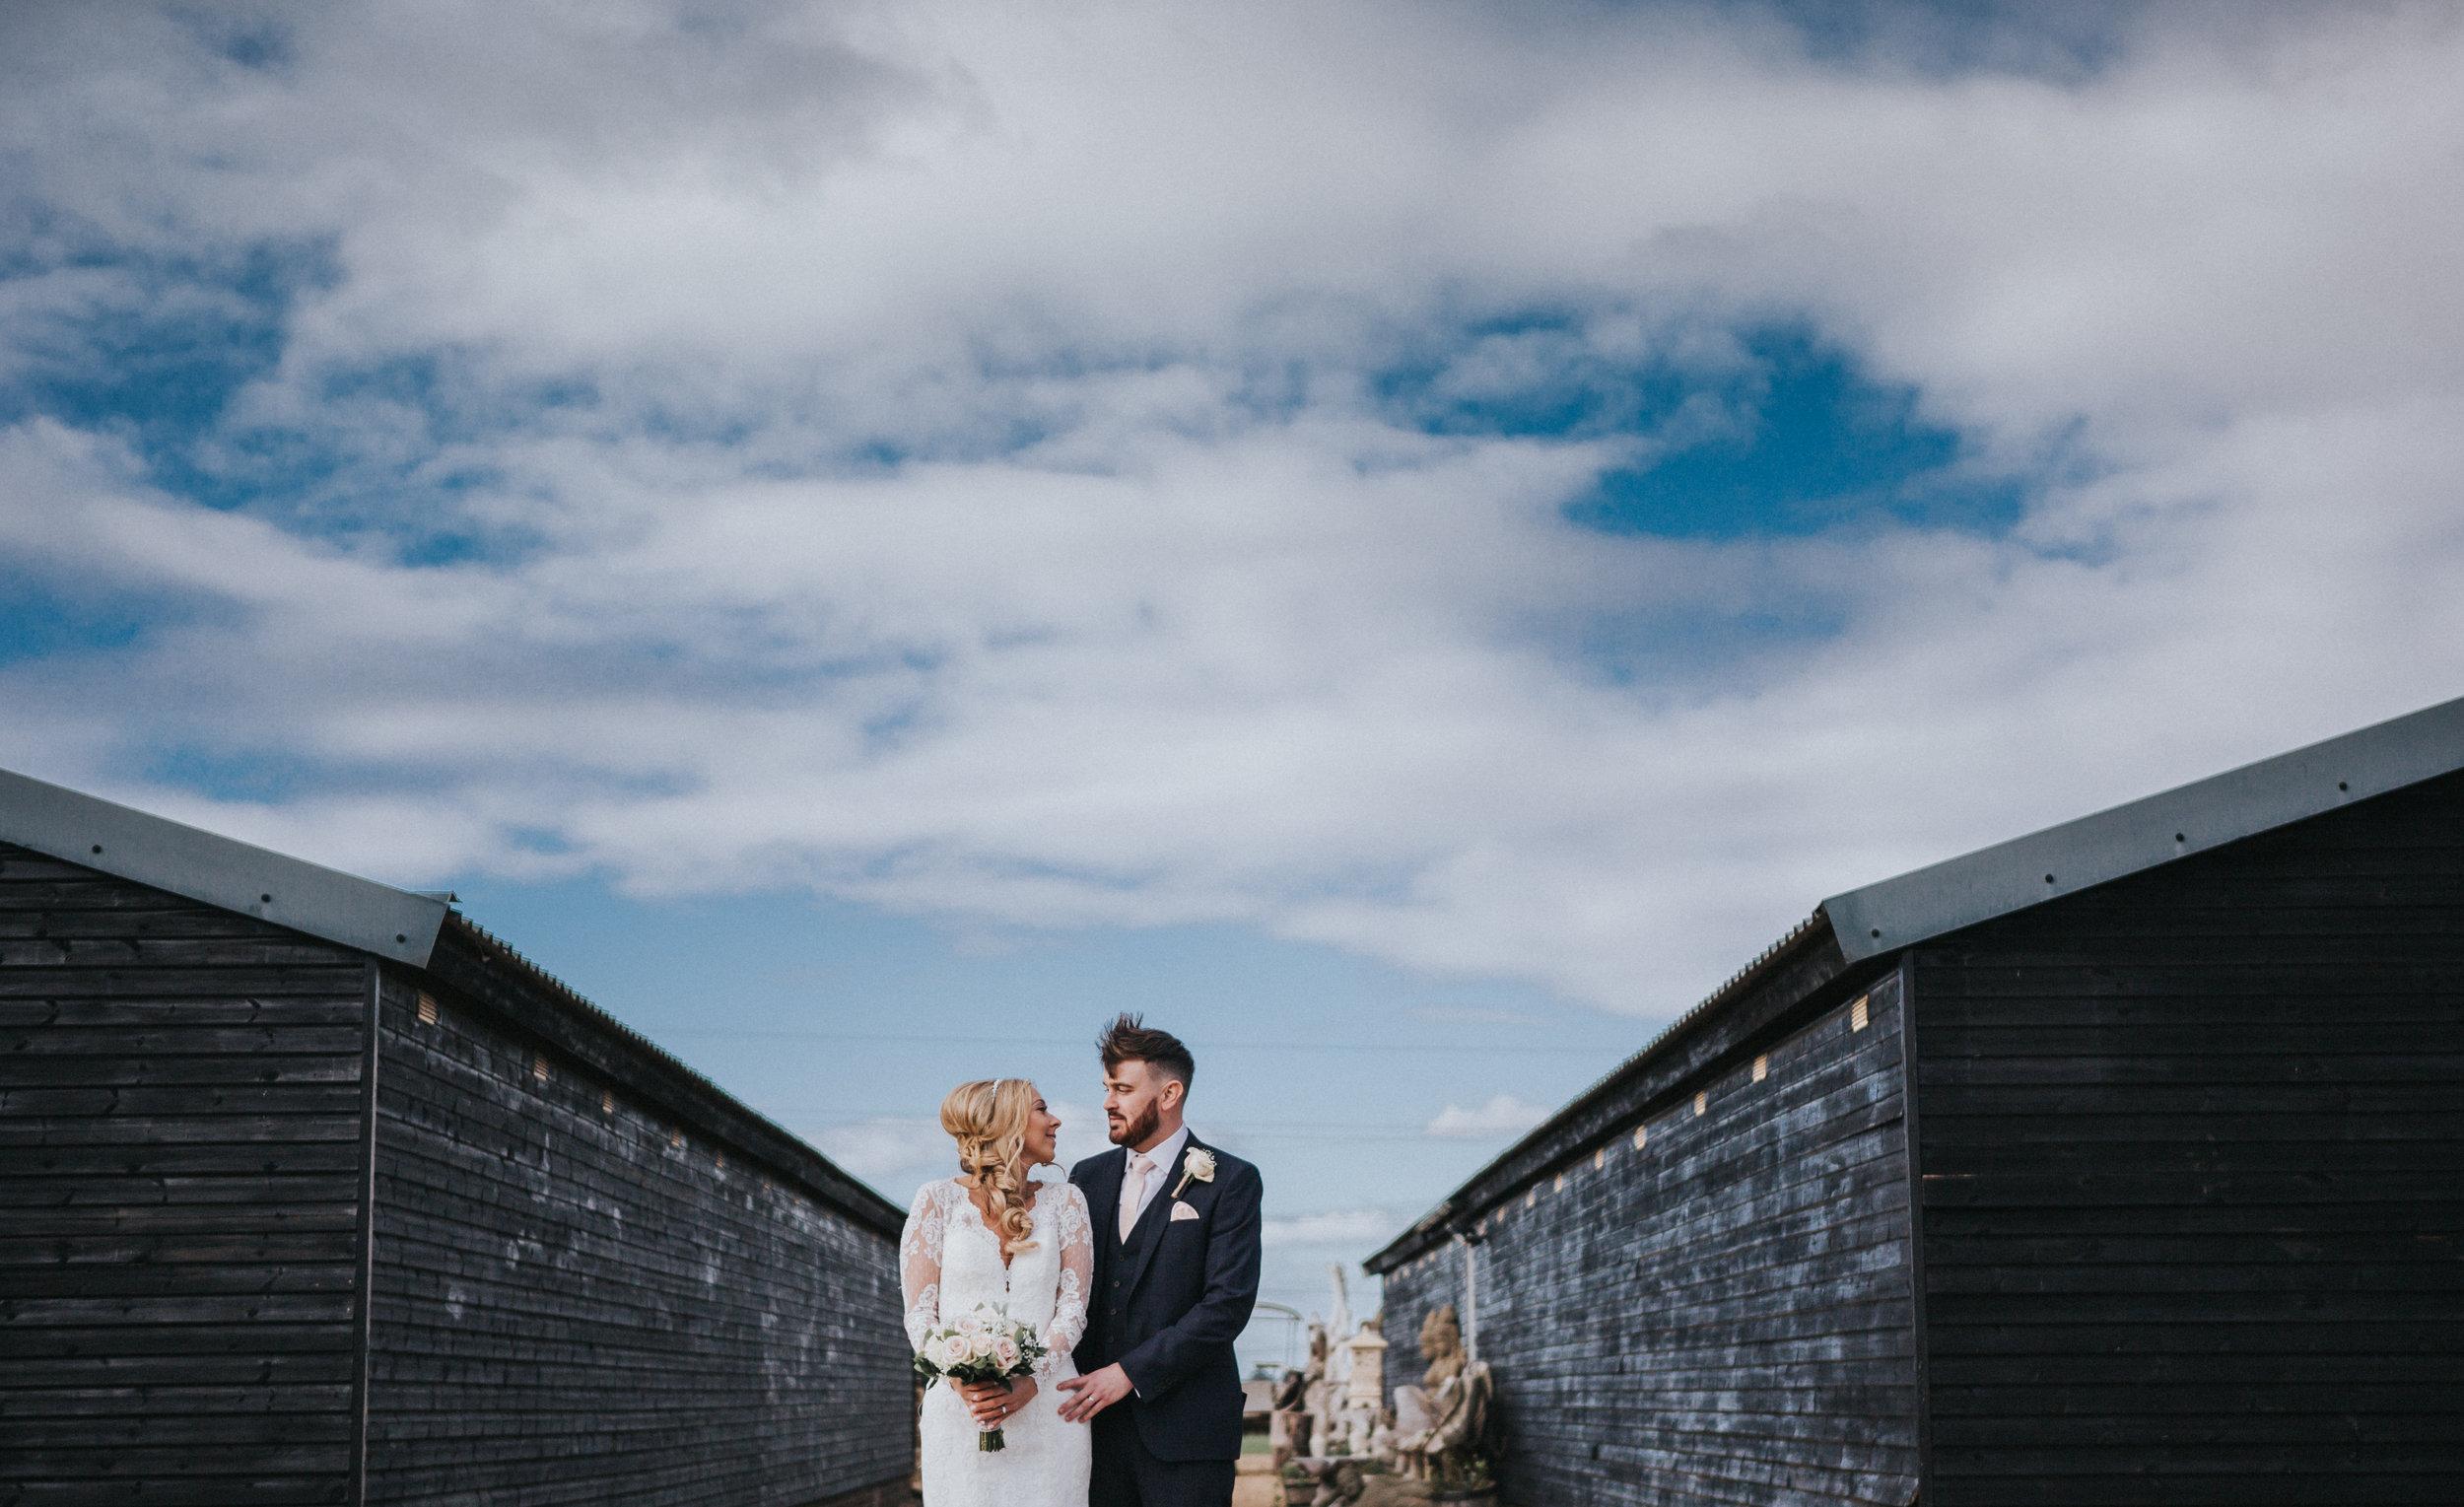 london-hertfordshire-wedding-photography-milling-barn-portrait-204